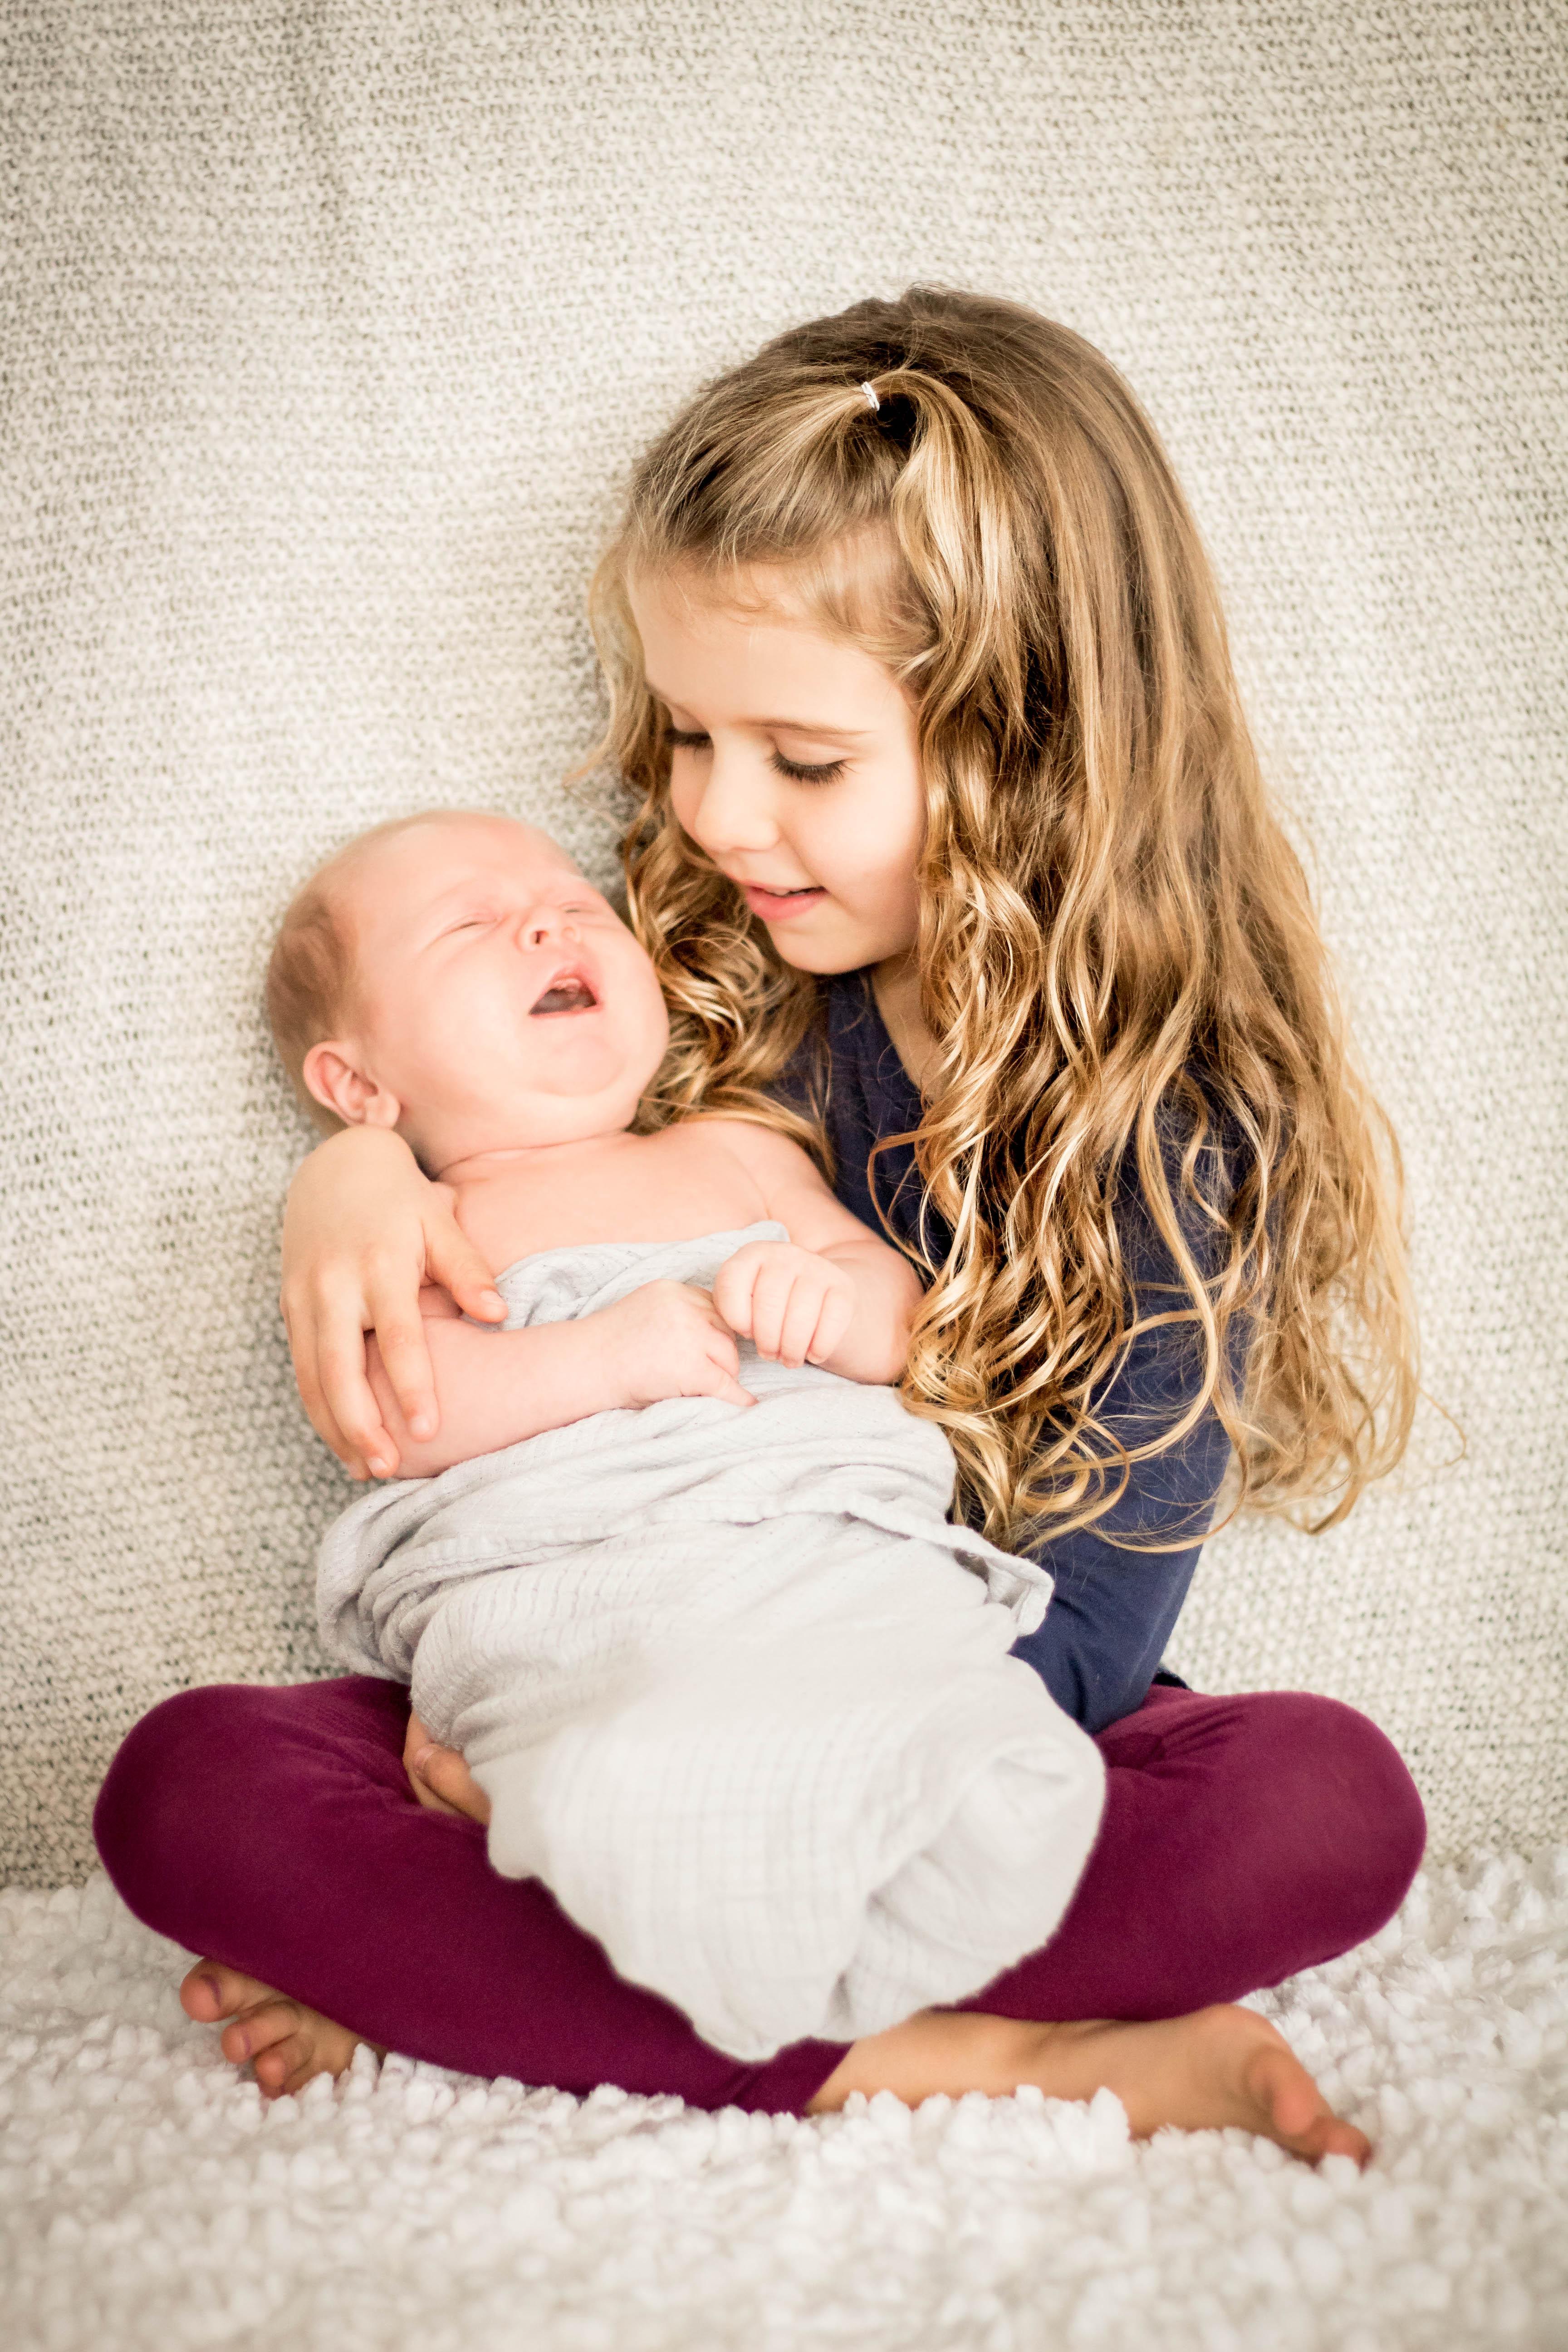 Newborn Photo Shoot by JeJe Design